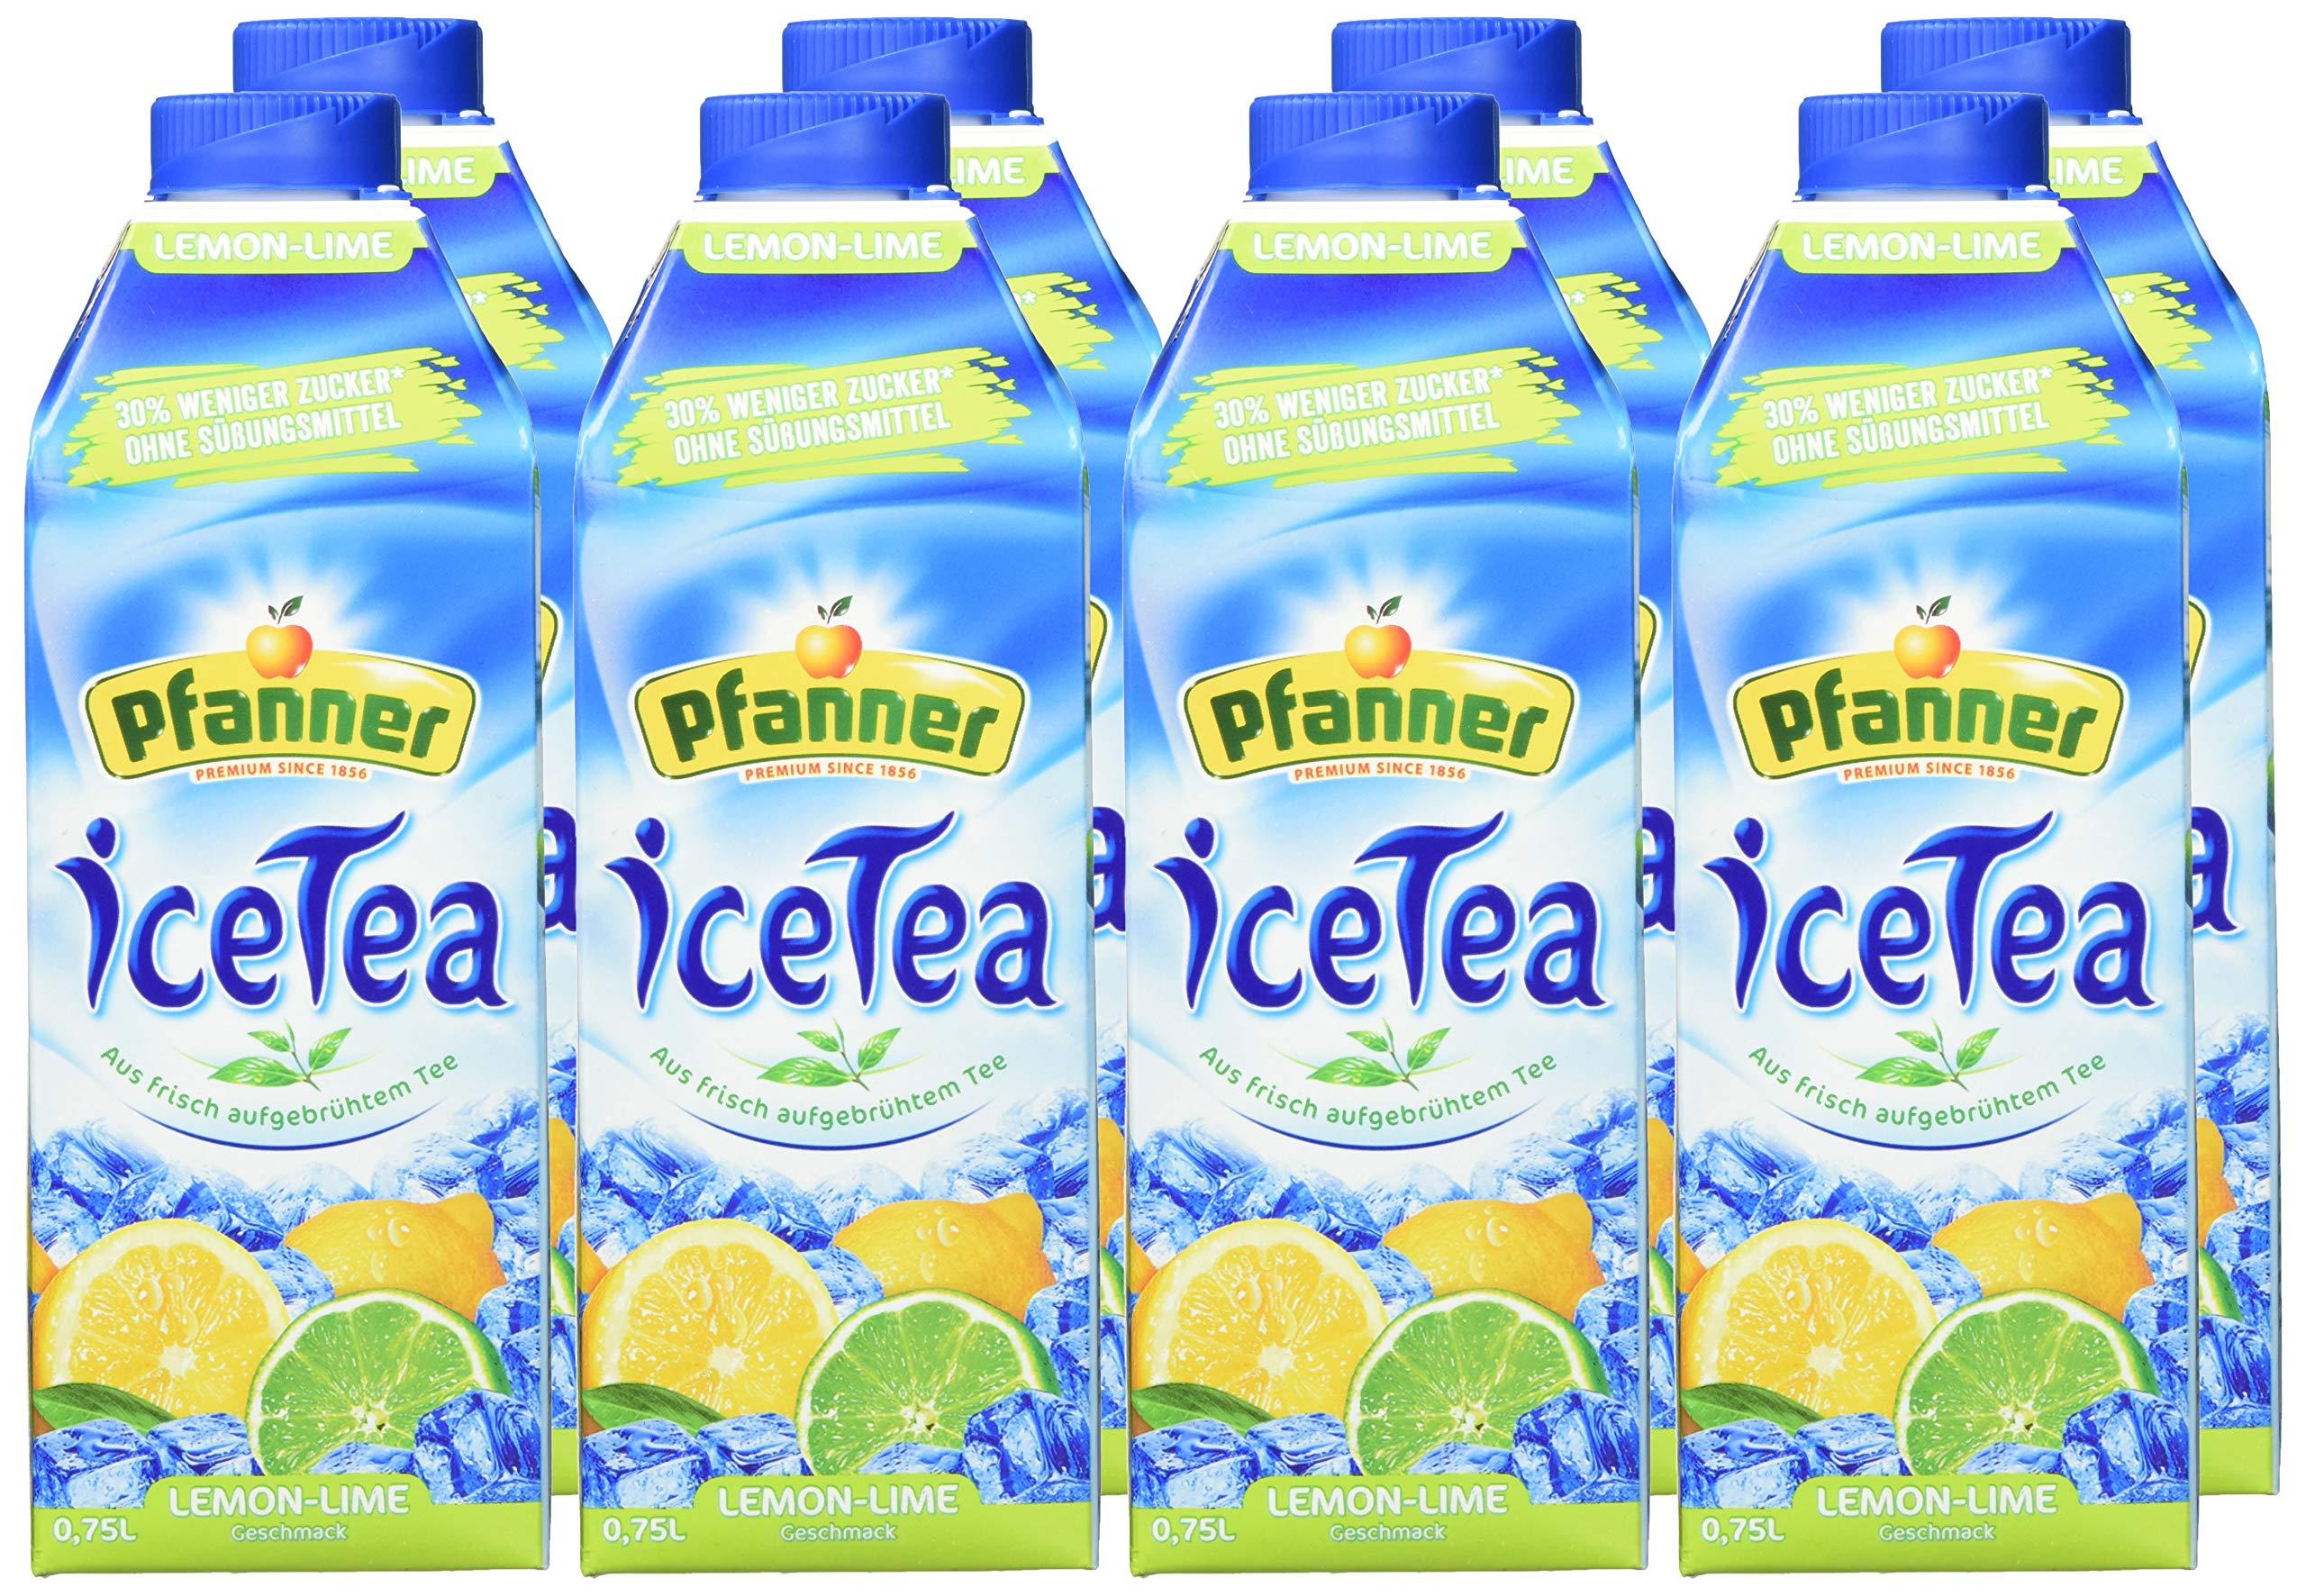 Pfanner-Eistee-Lemon-Lime-zuckerreduziert-8er-Pack-8-x-750-g